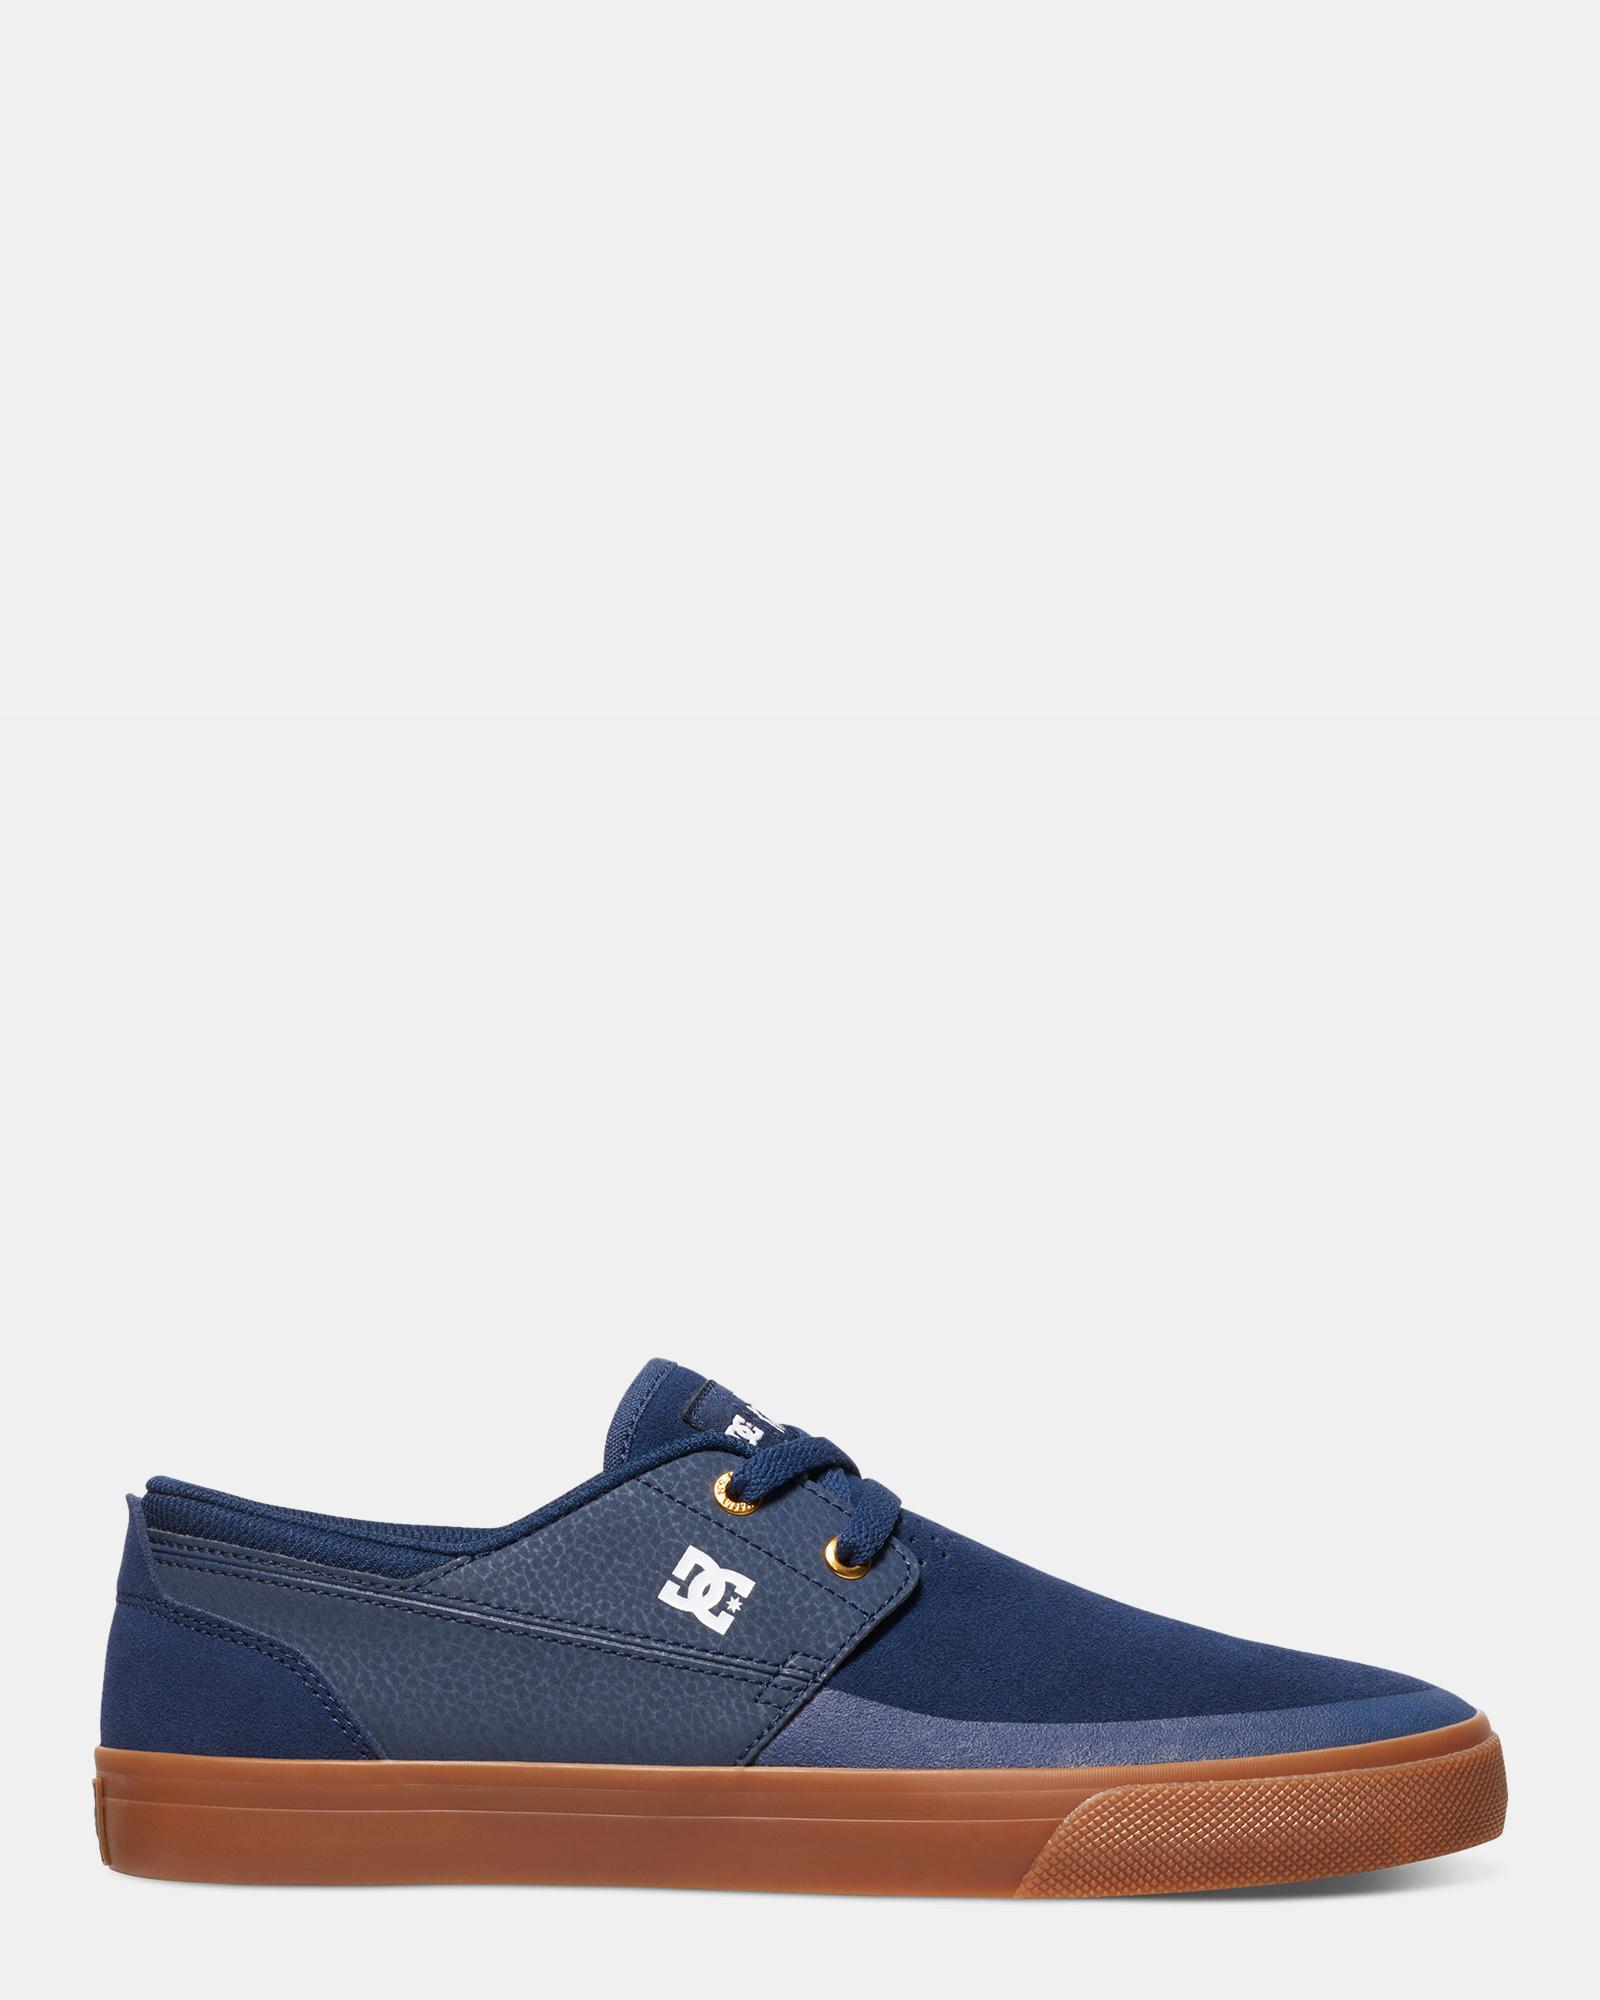 DC Mens Wes Kremer 2 S Shoe